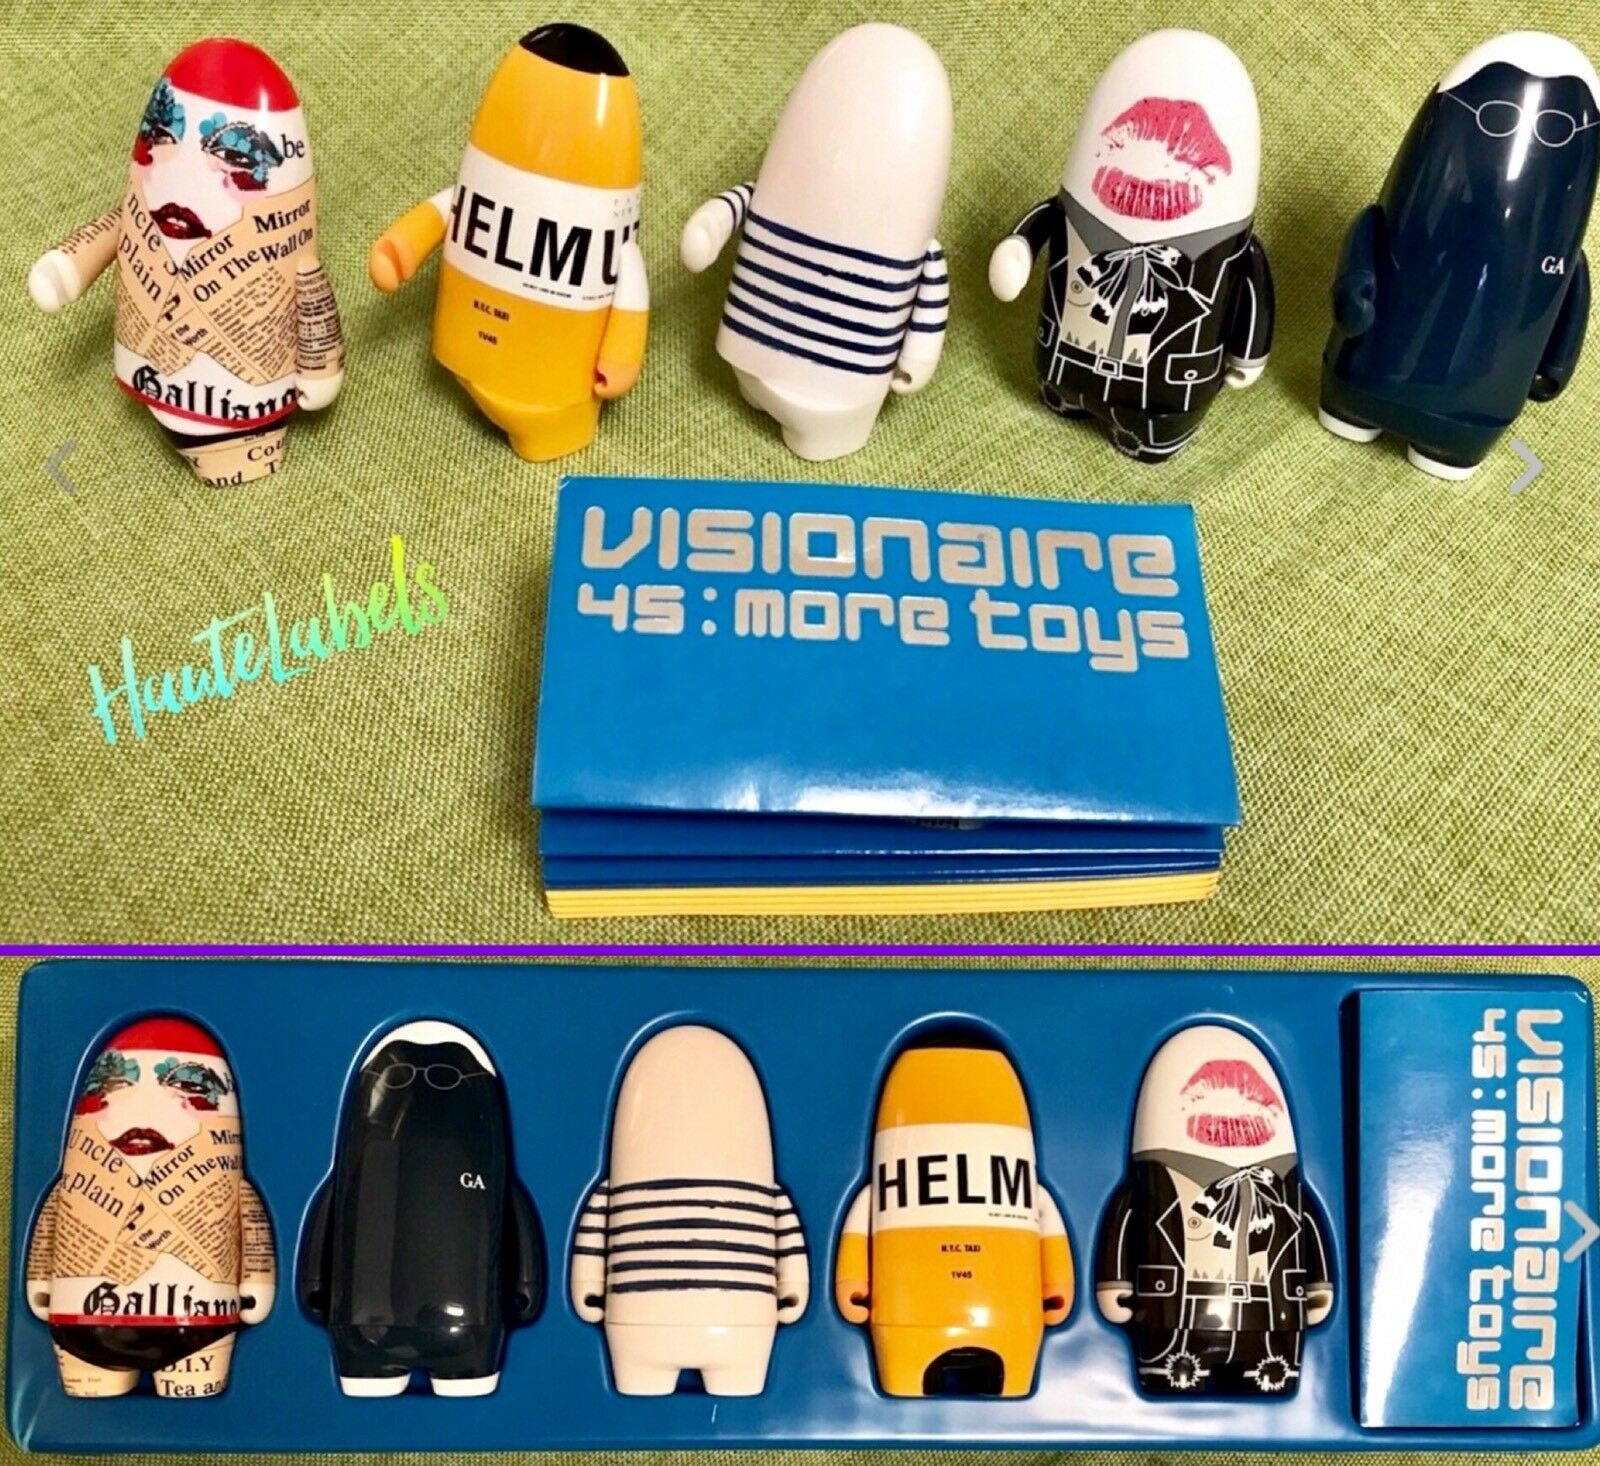 KIDROBOT 45 More Toys VISIONAIRE bluee Set GAULTIER, ARMANI, LANG, GALLIANO, YSL